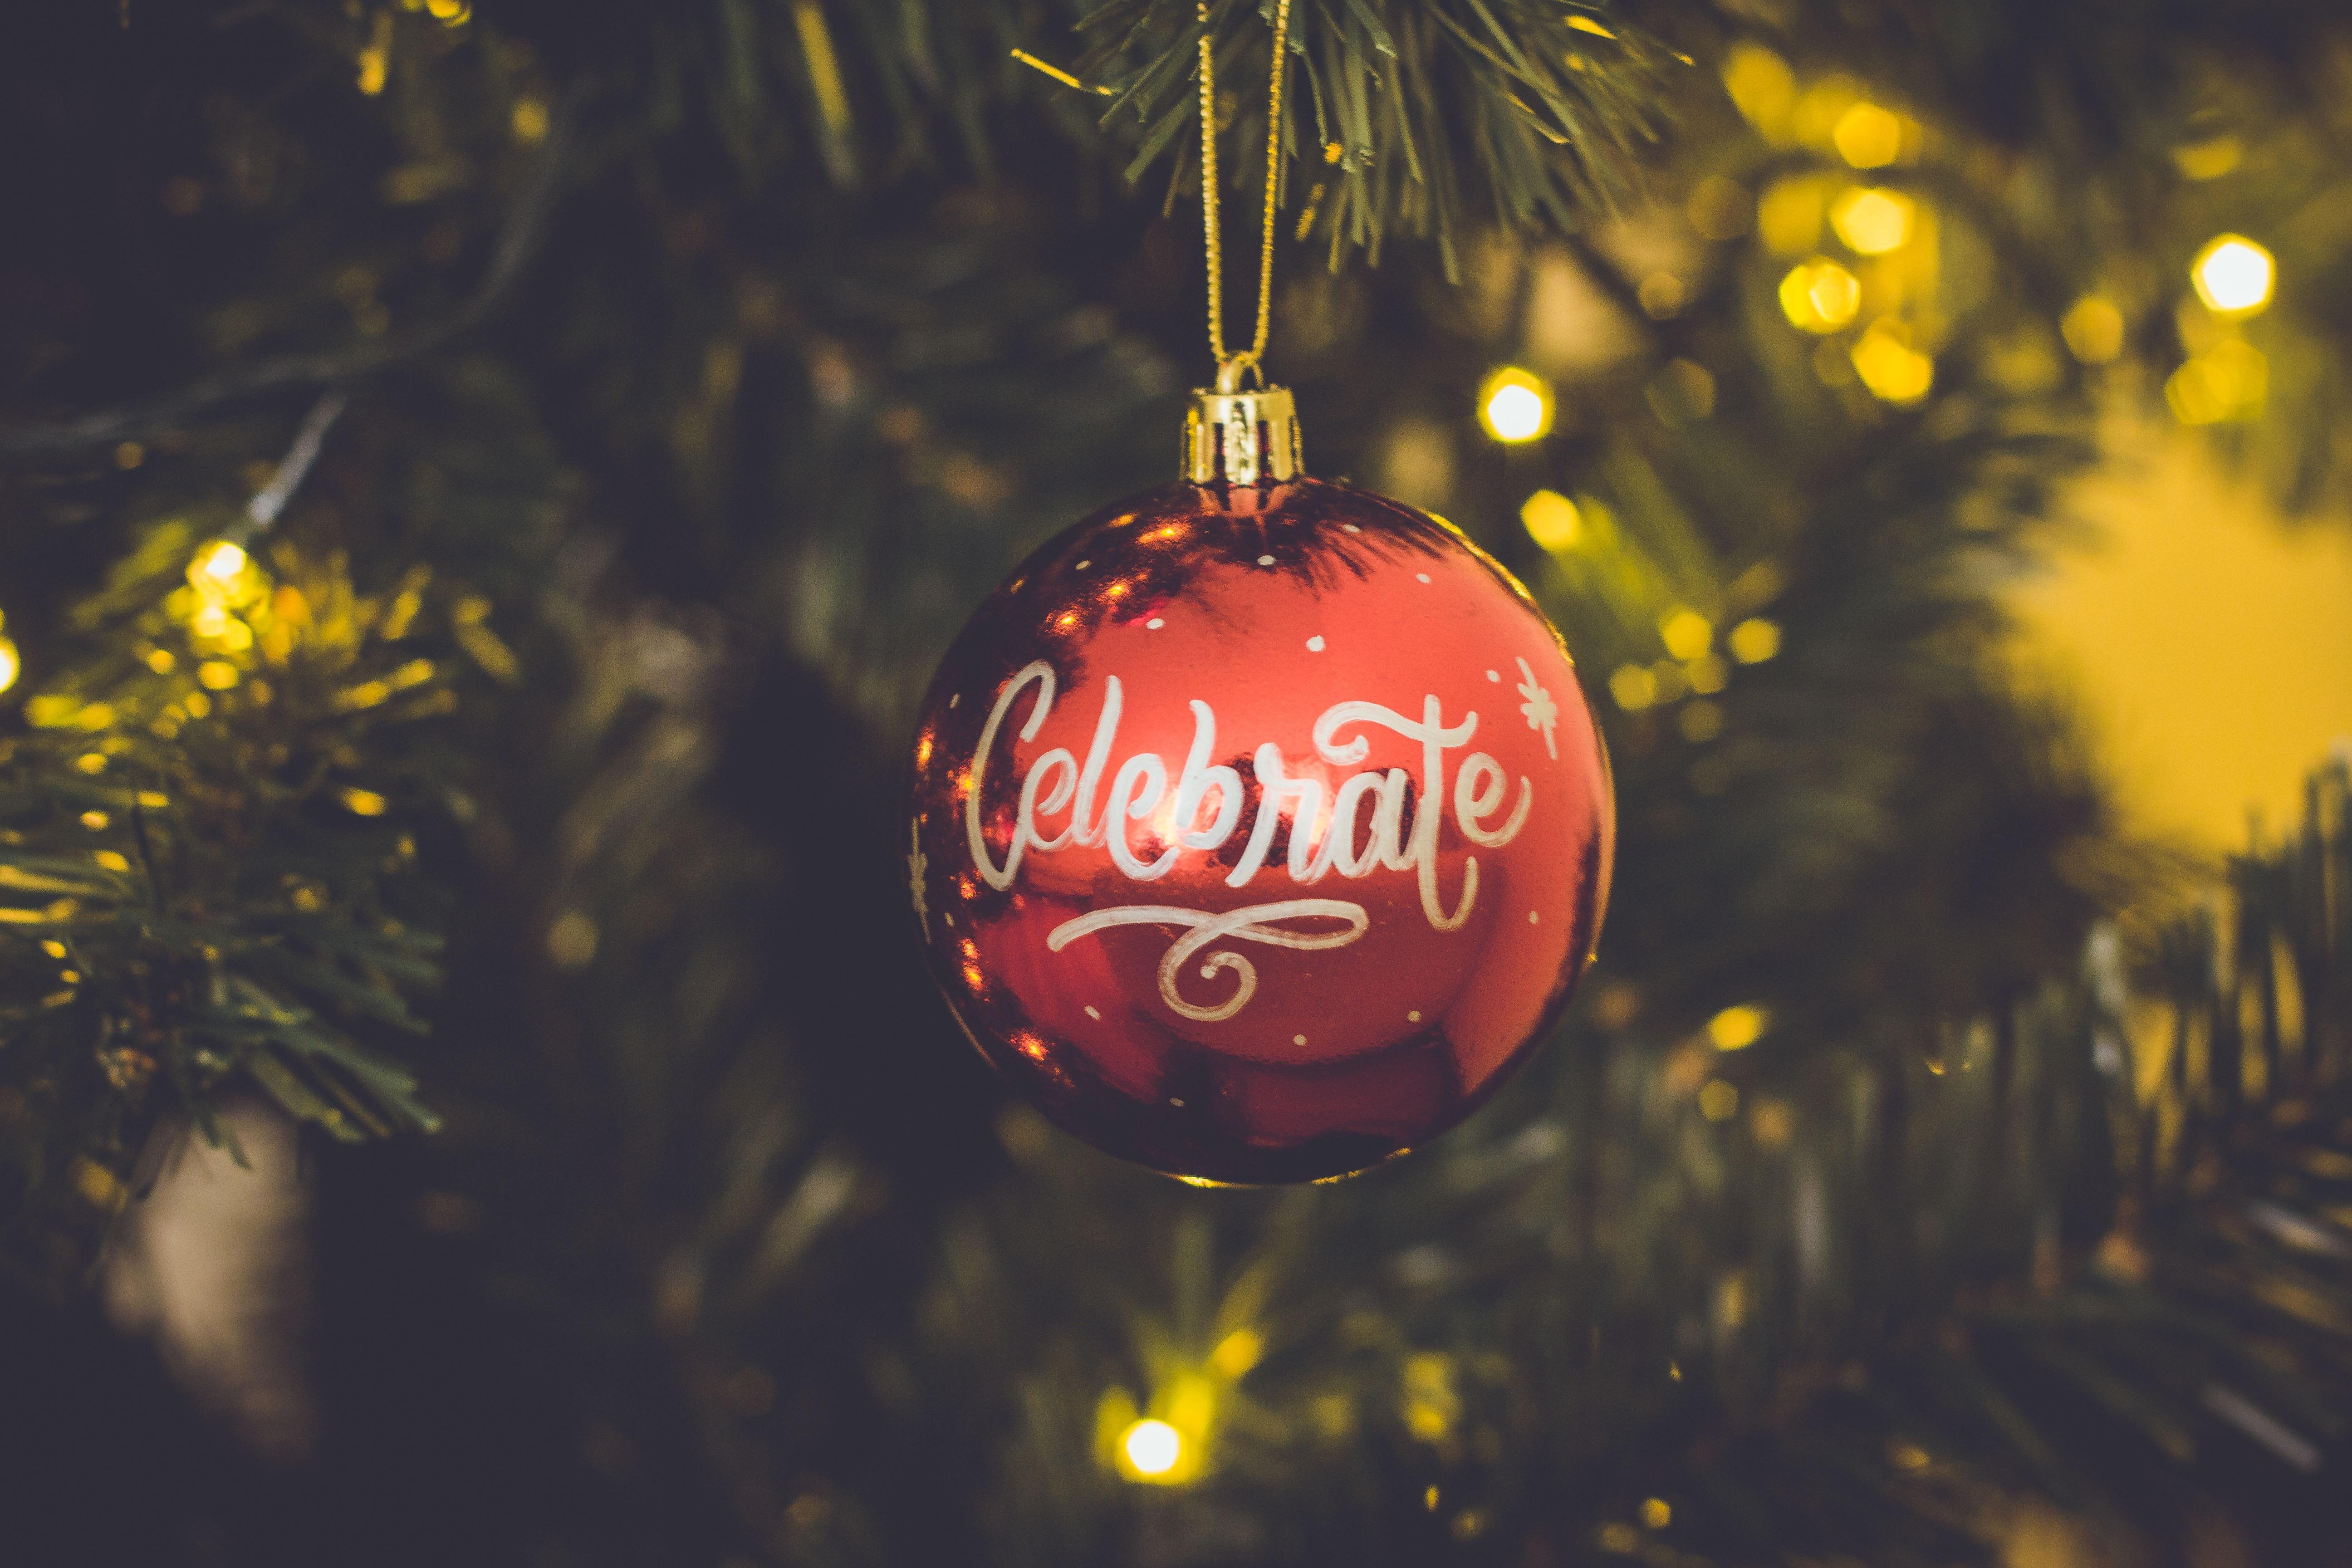 Free Images Bokeh Bright Celebrate Christmas Ball